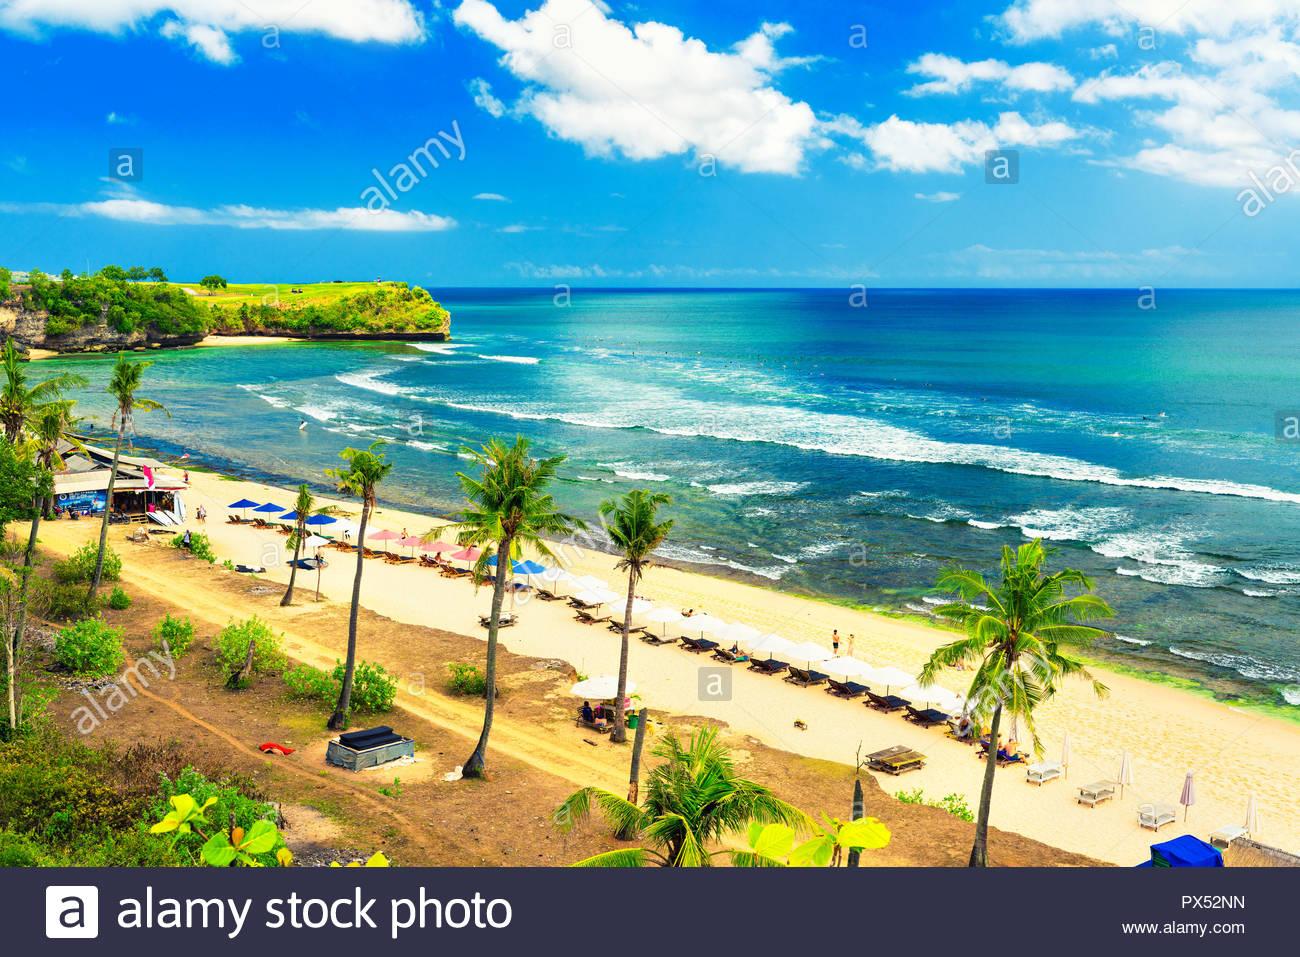 Happy travel tourist enjoy vacation on tropical beach Bali on 1300x957